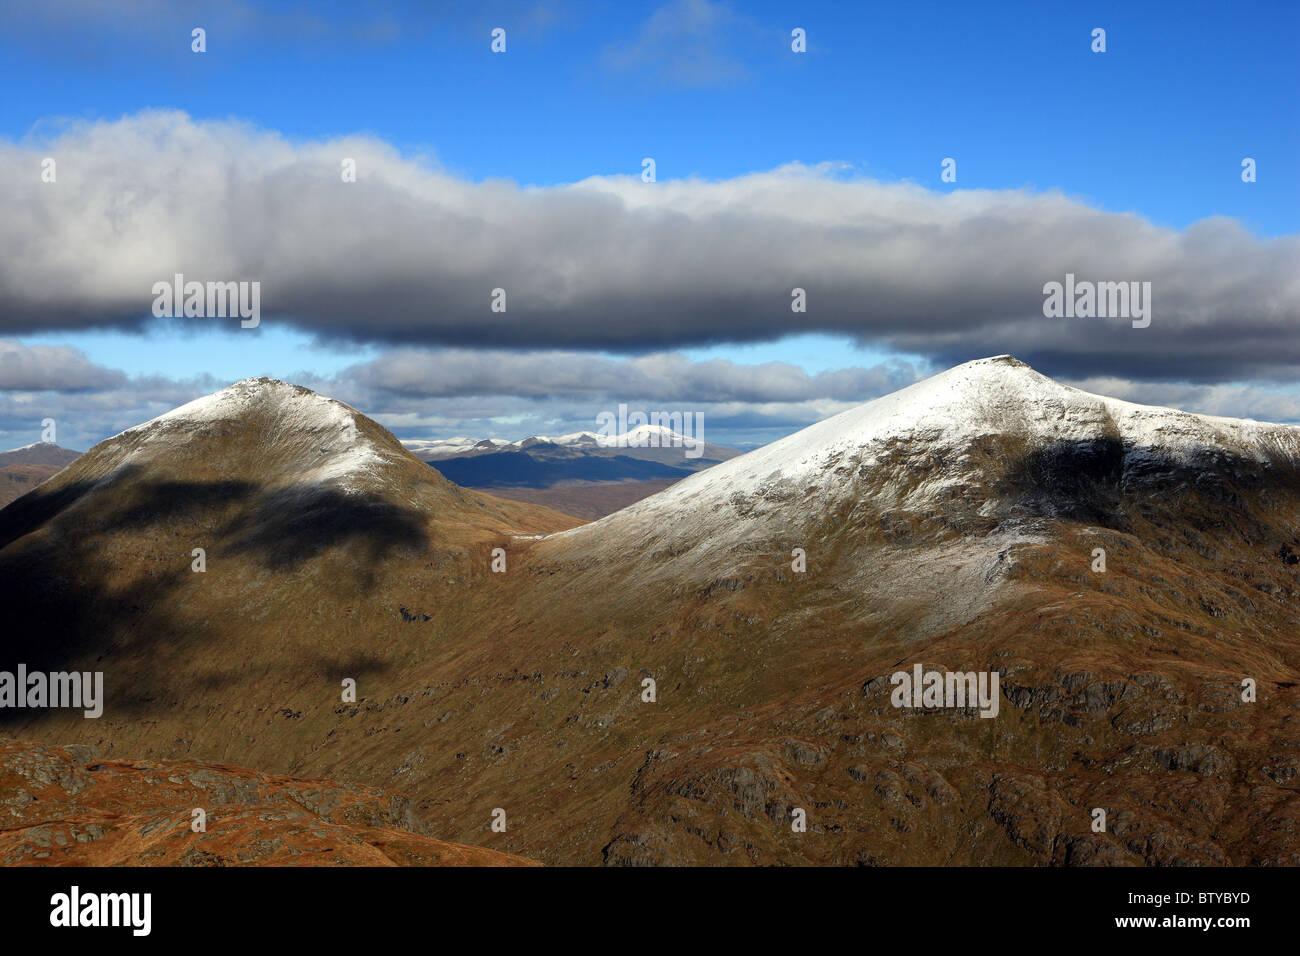 Ben More (left) and Stob Binnein (right) mountains near Crianlarich, Scotland - Stock Image